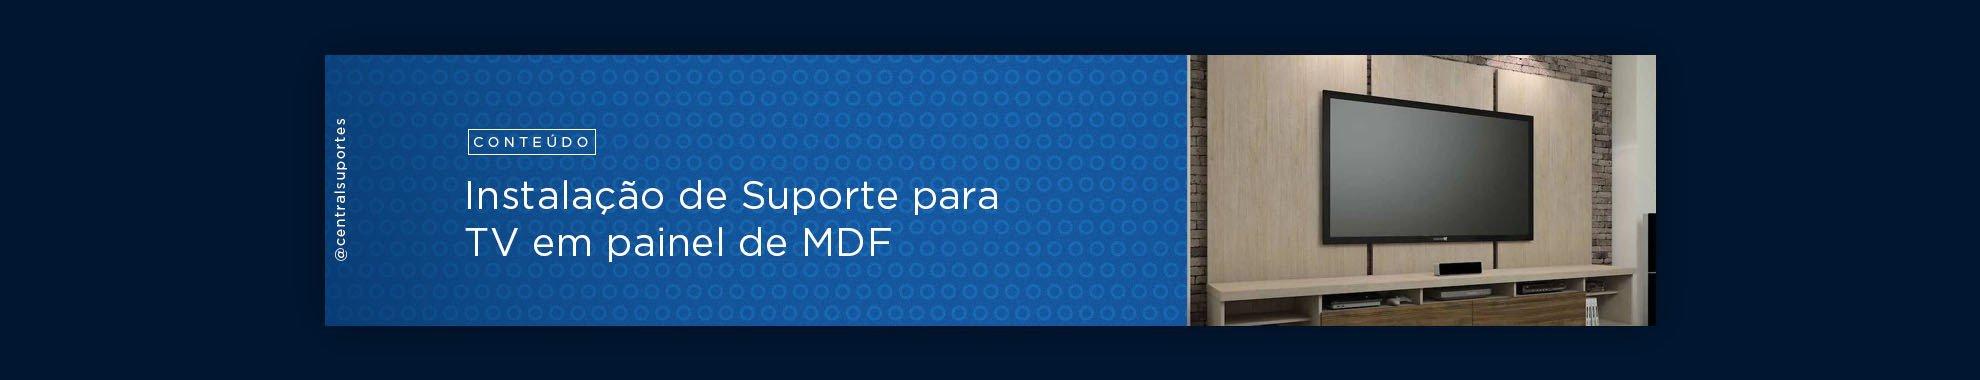 banner topo conteudo instalacao suporte painel mdf